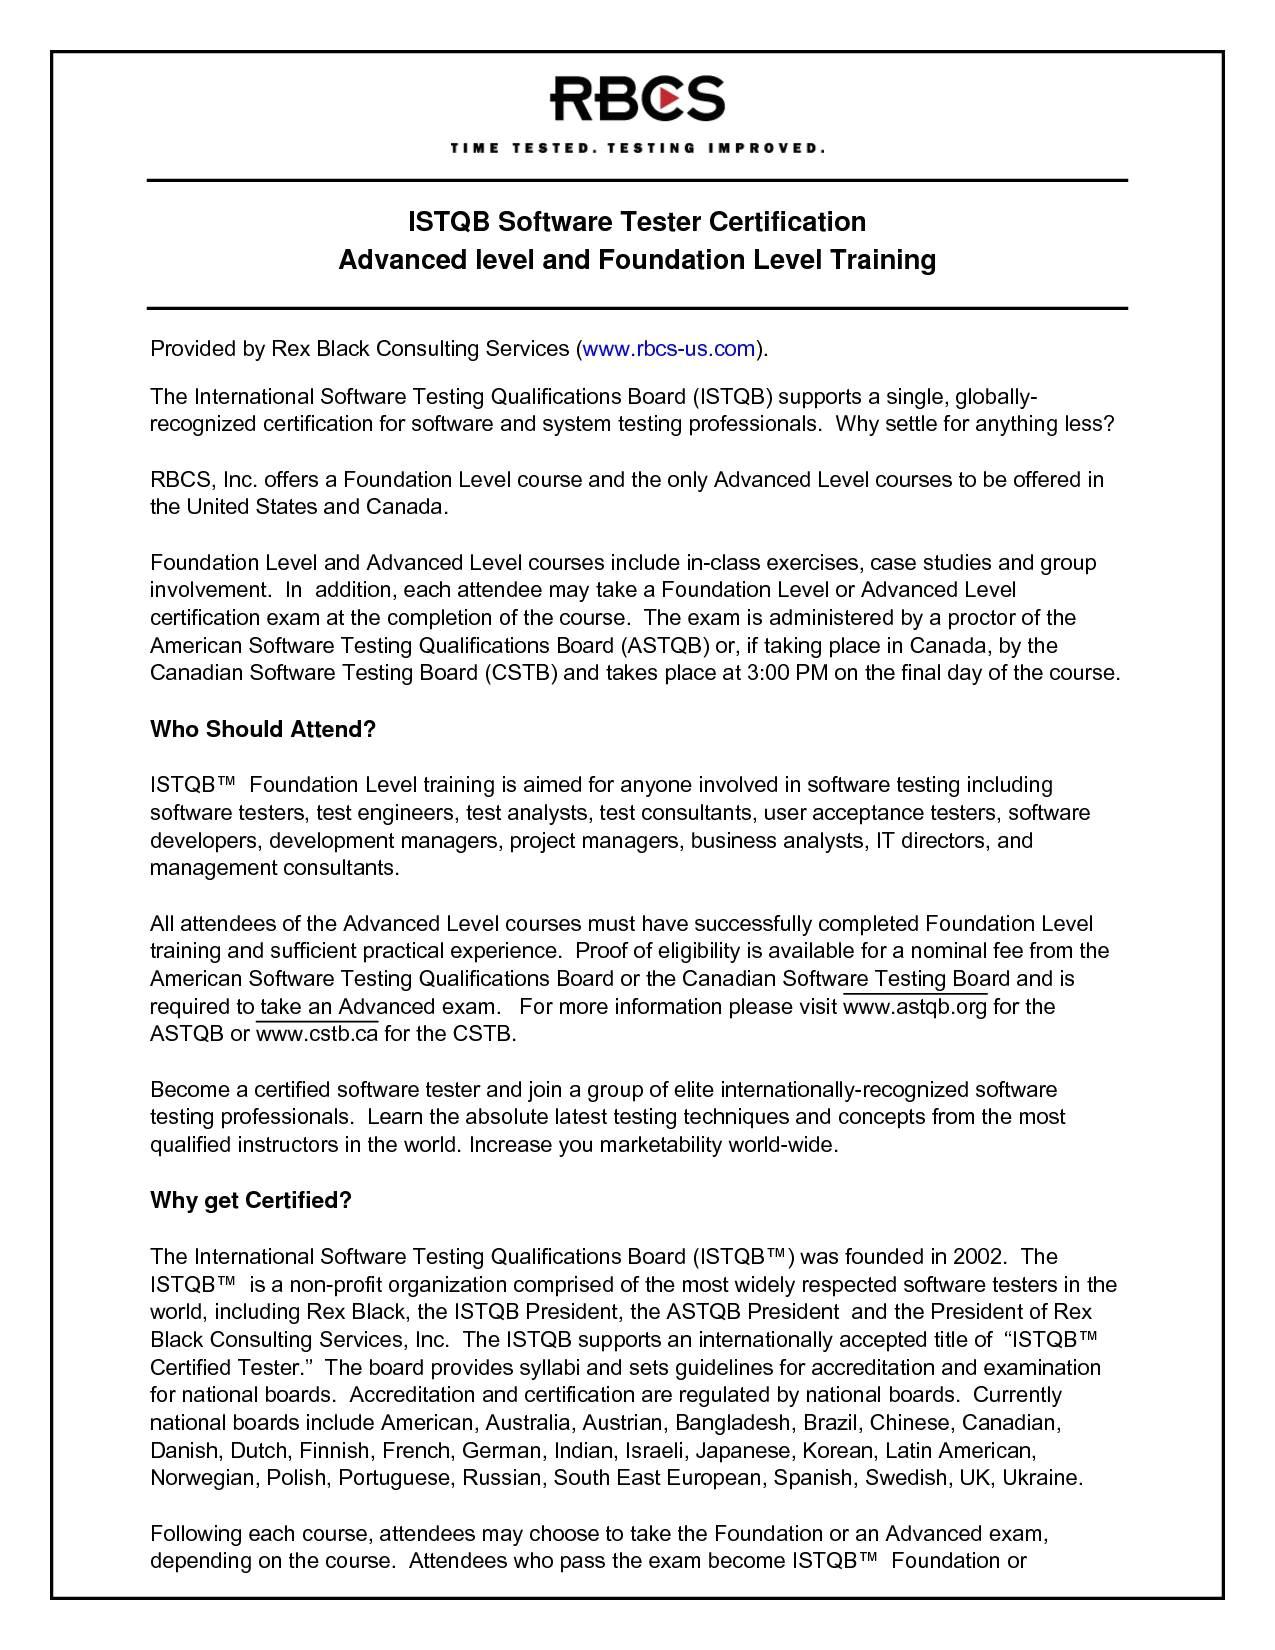 sample qa resume inspirational software testing resume samples for 1 year experience lovely qa